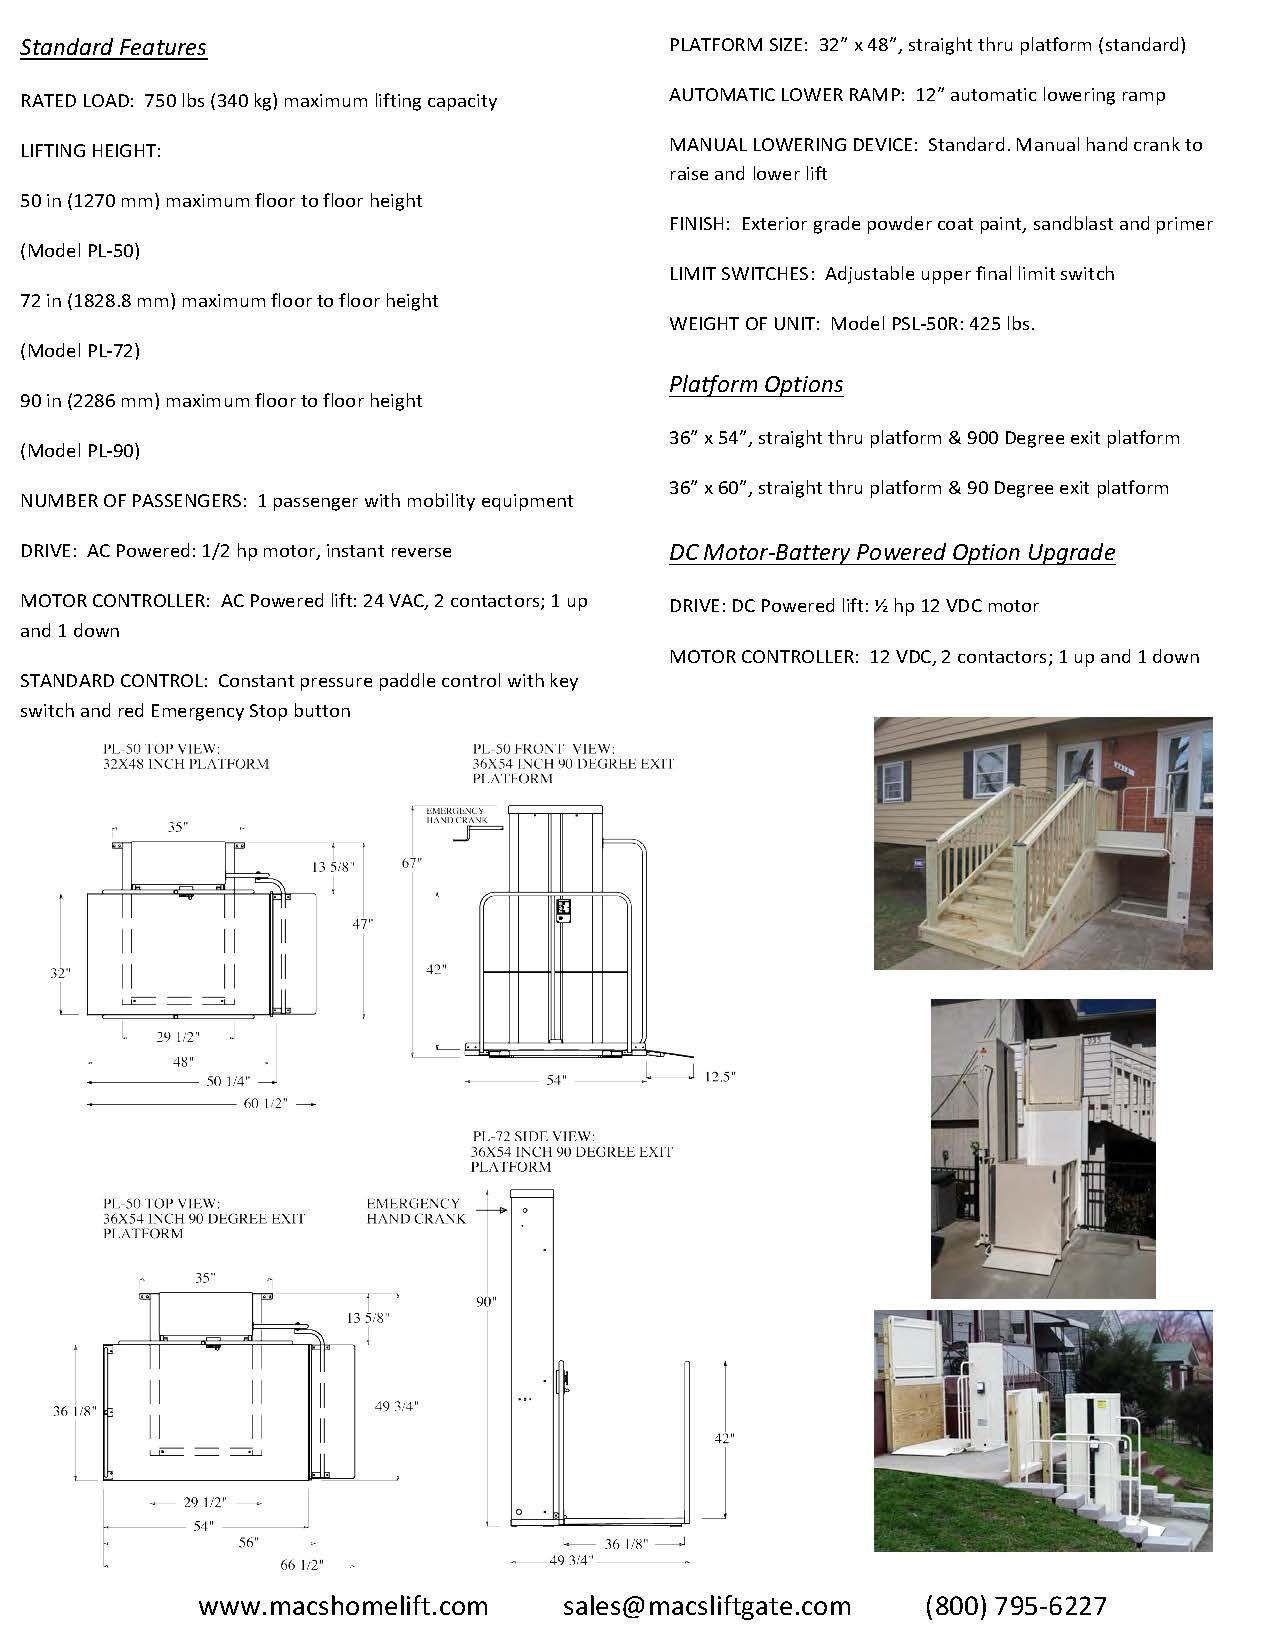 Mac\'s Vertical Home Lift PL-50 Vertical Platform Llift (VPL ...